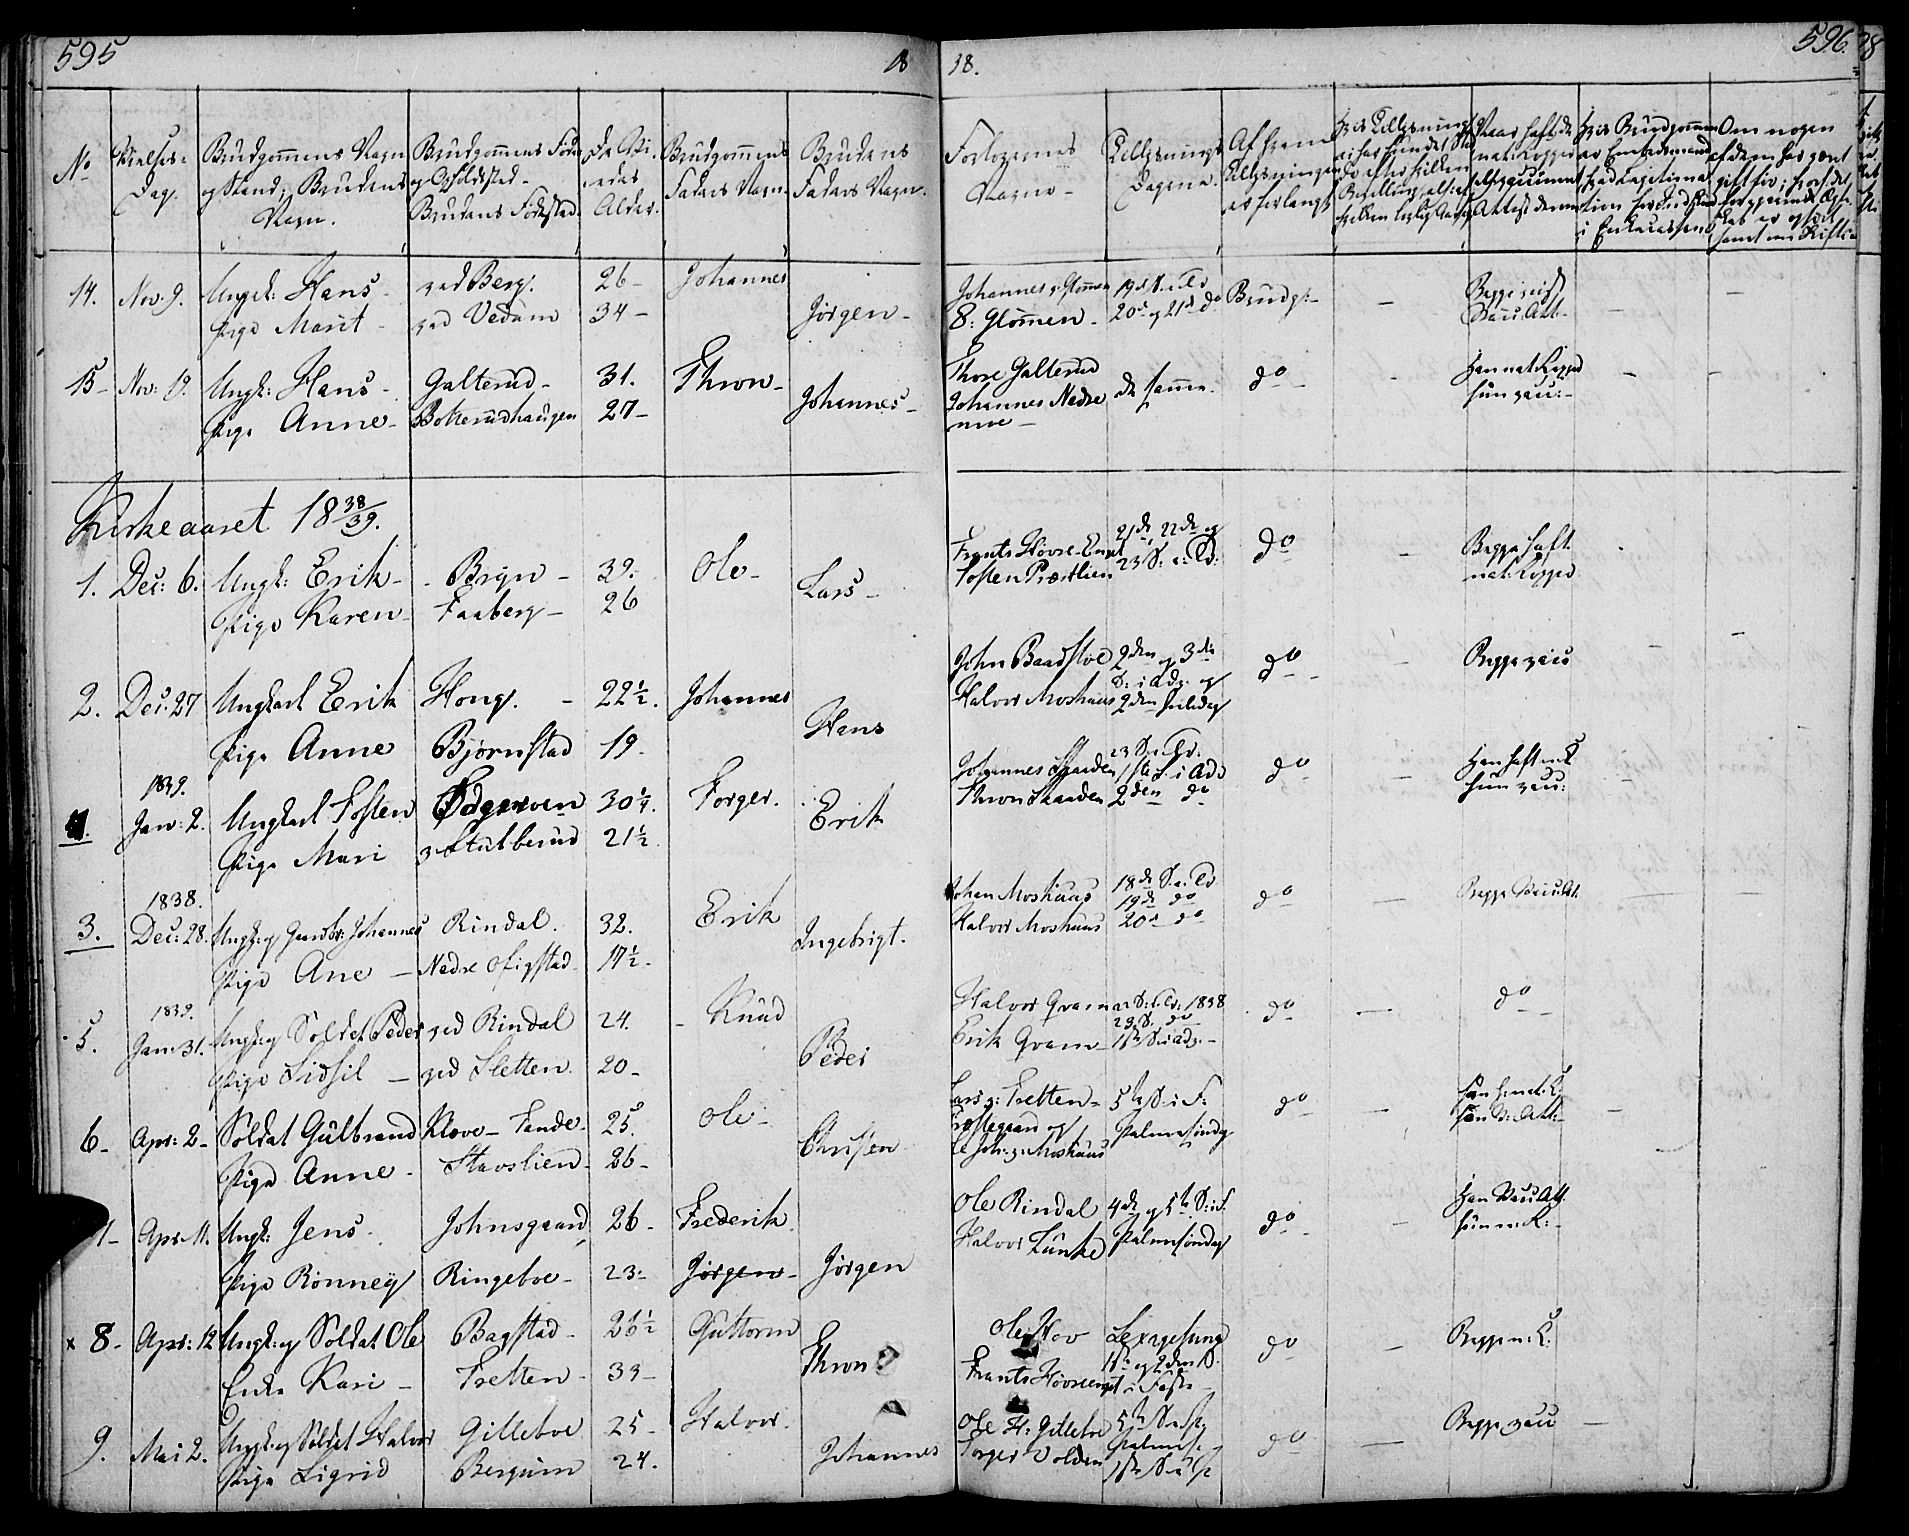 SAH, Øyer prestekontor, Ministerialbok nr. 4, 1824-1841, s. 595-596